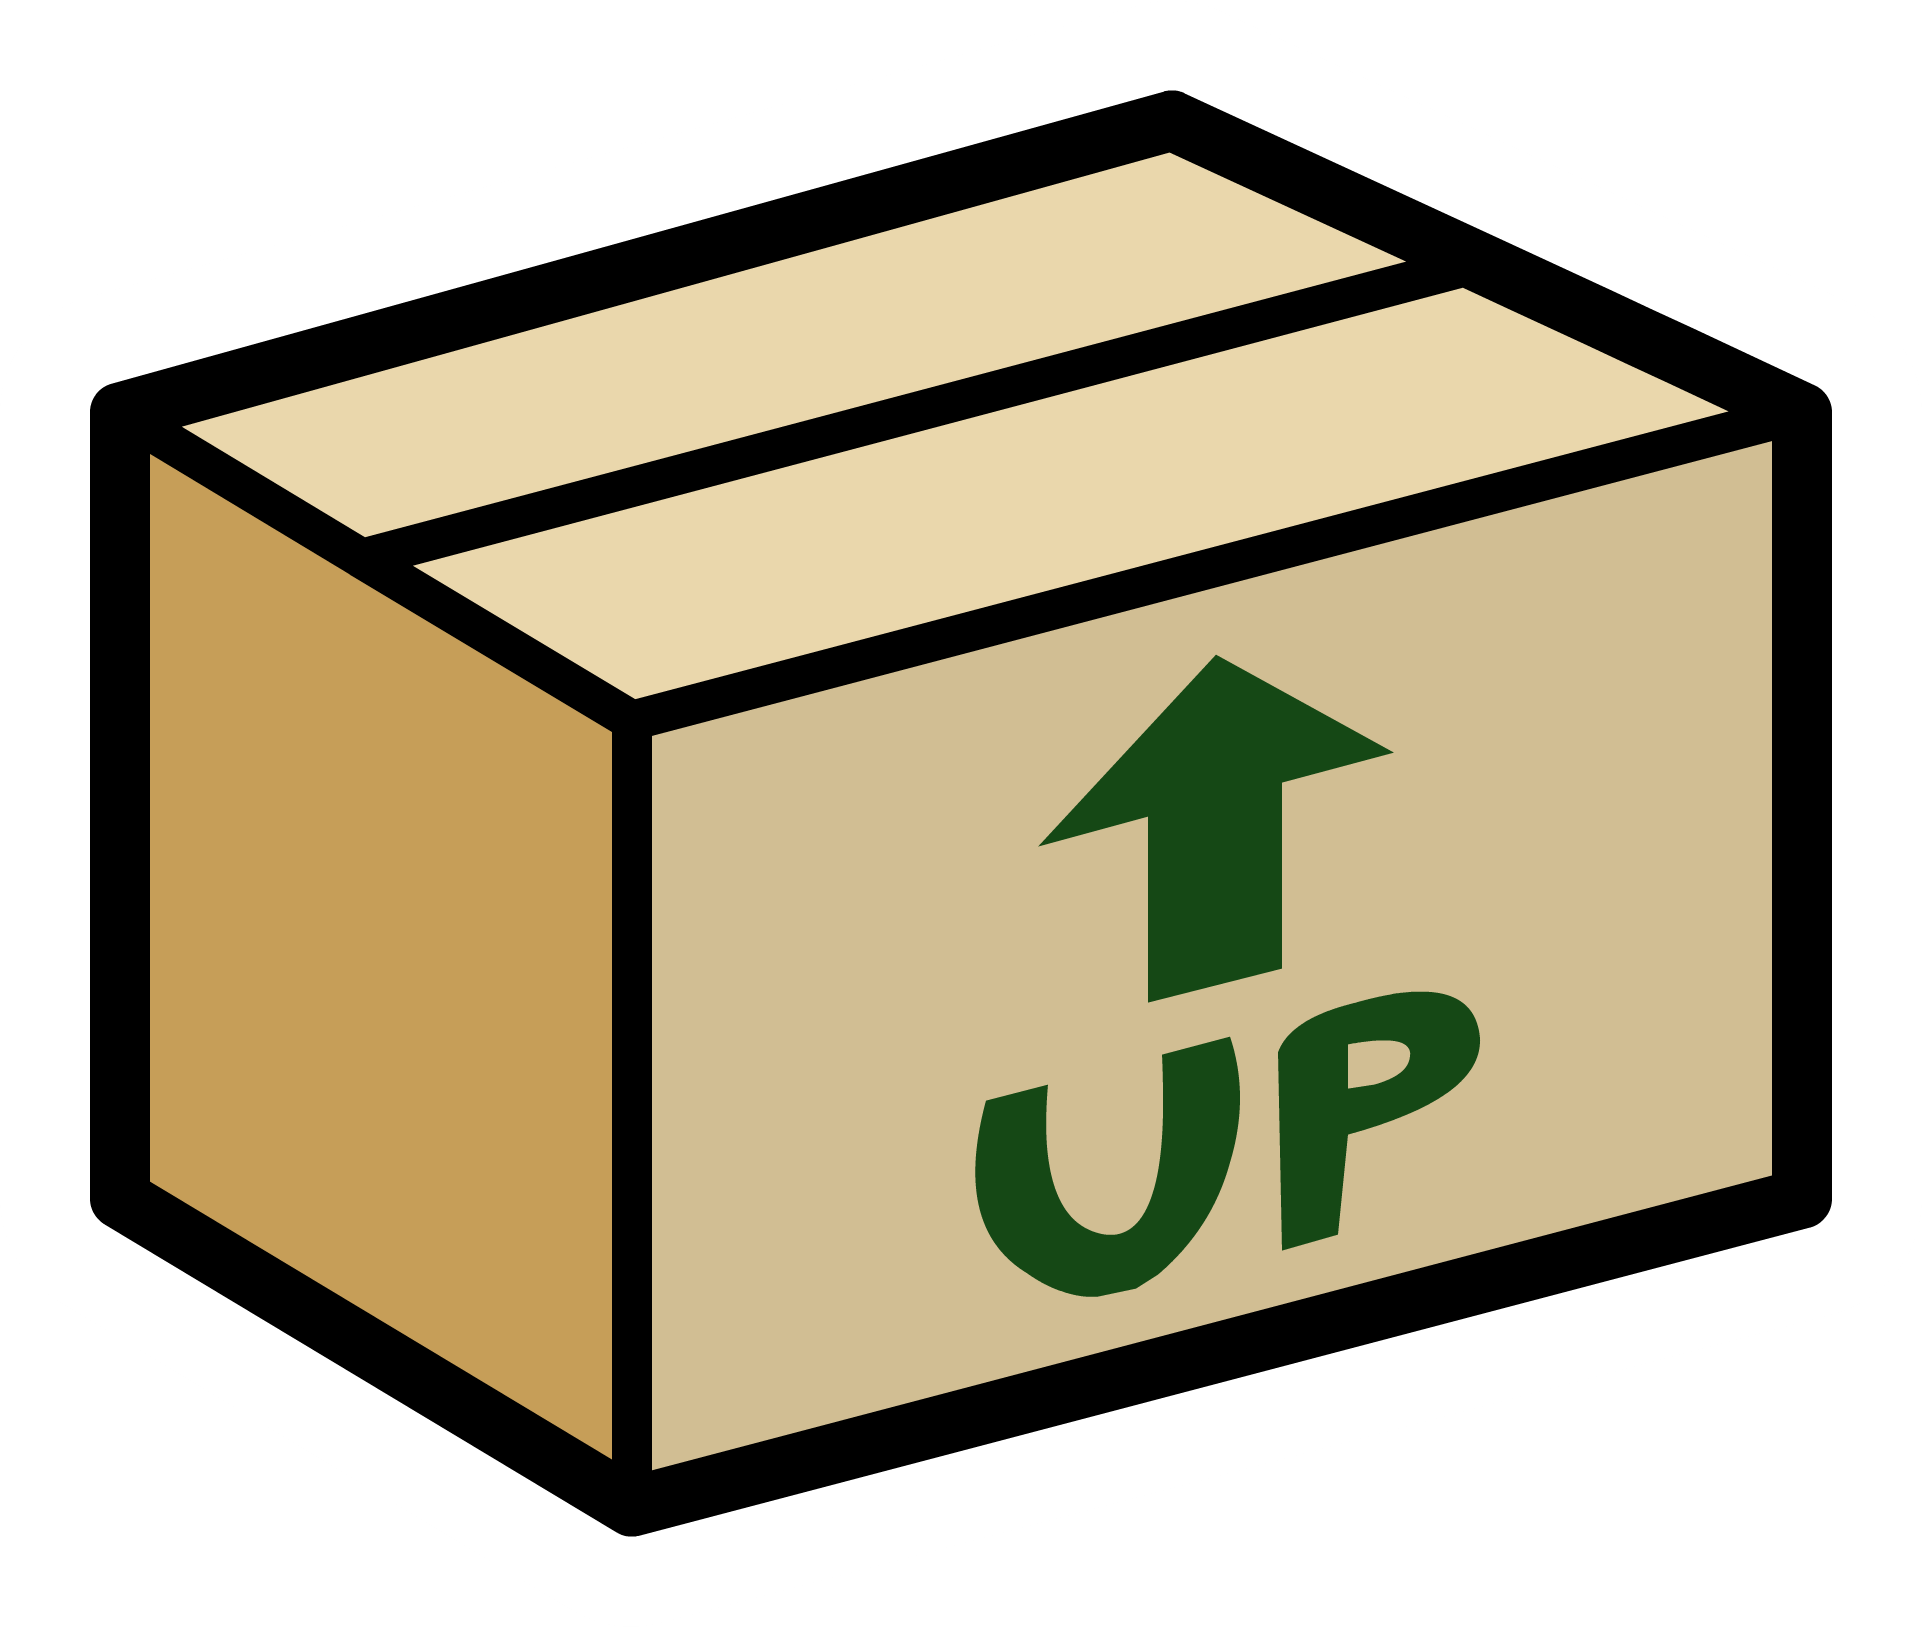 cardboard box png. cardboard box pinpng png